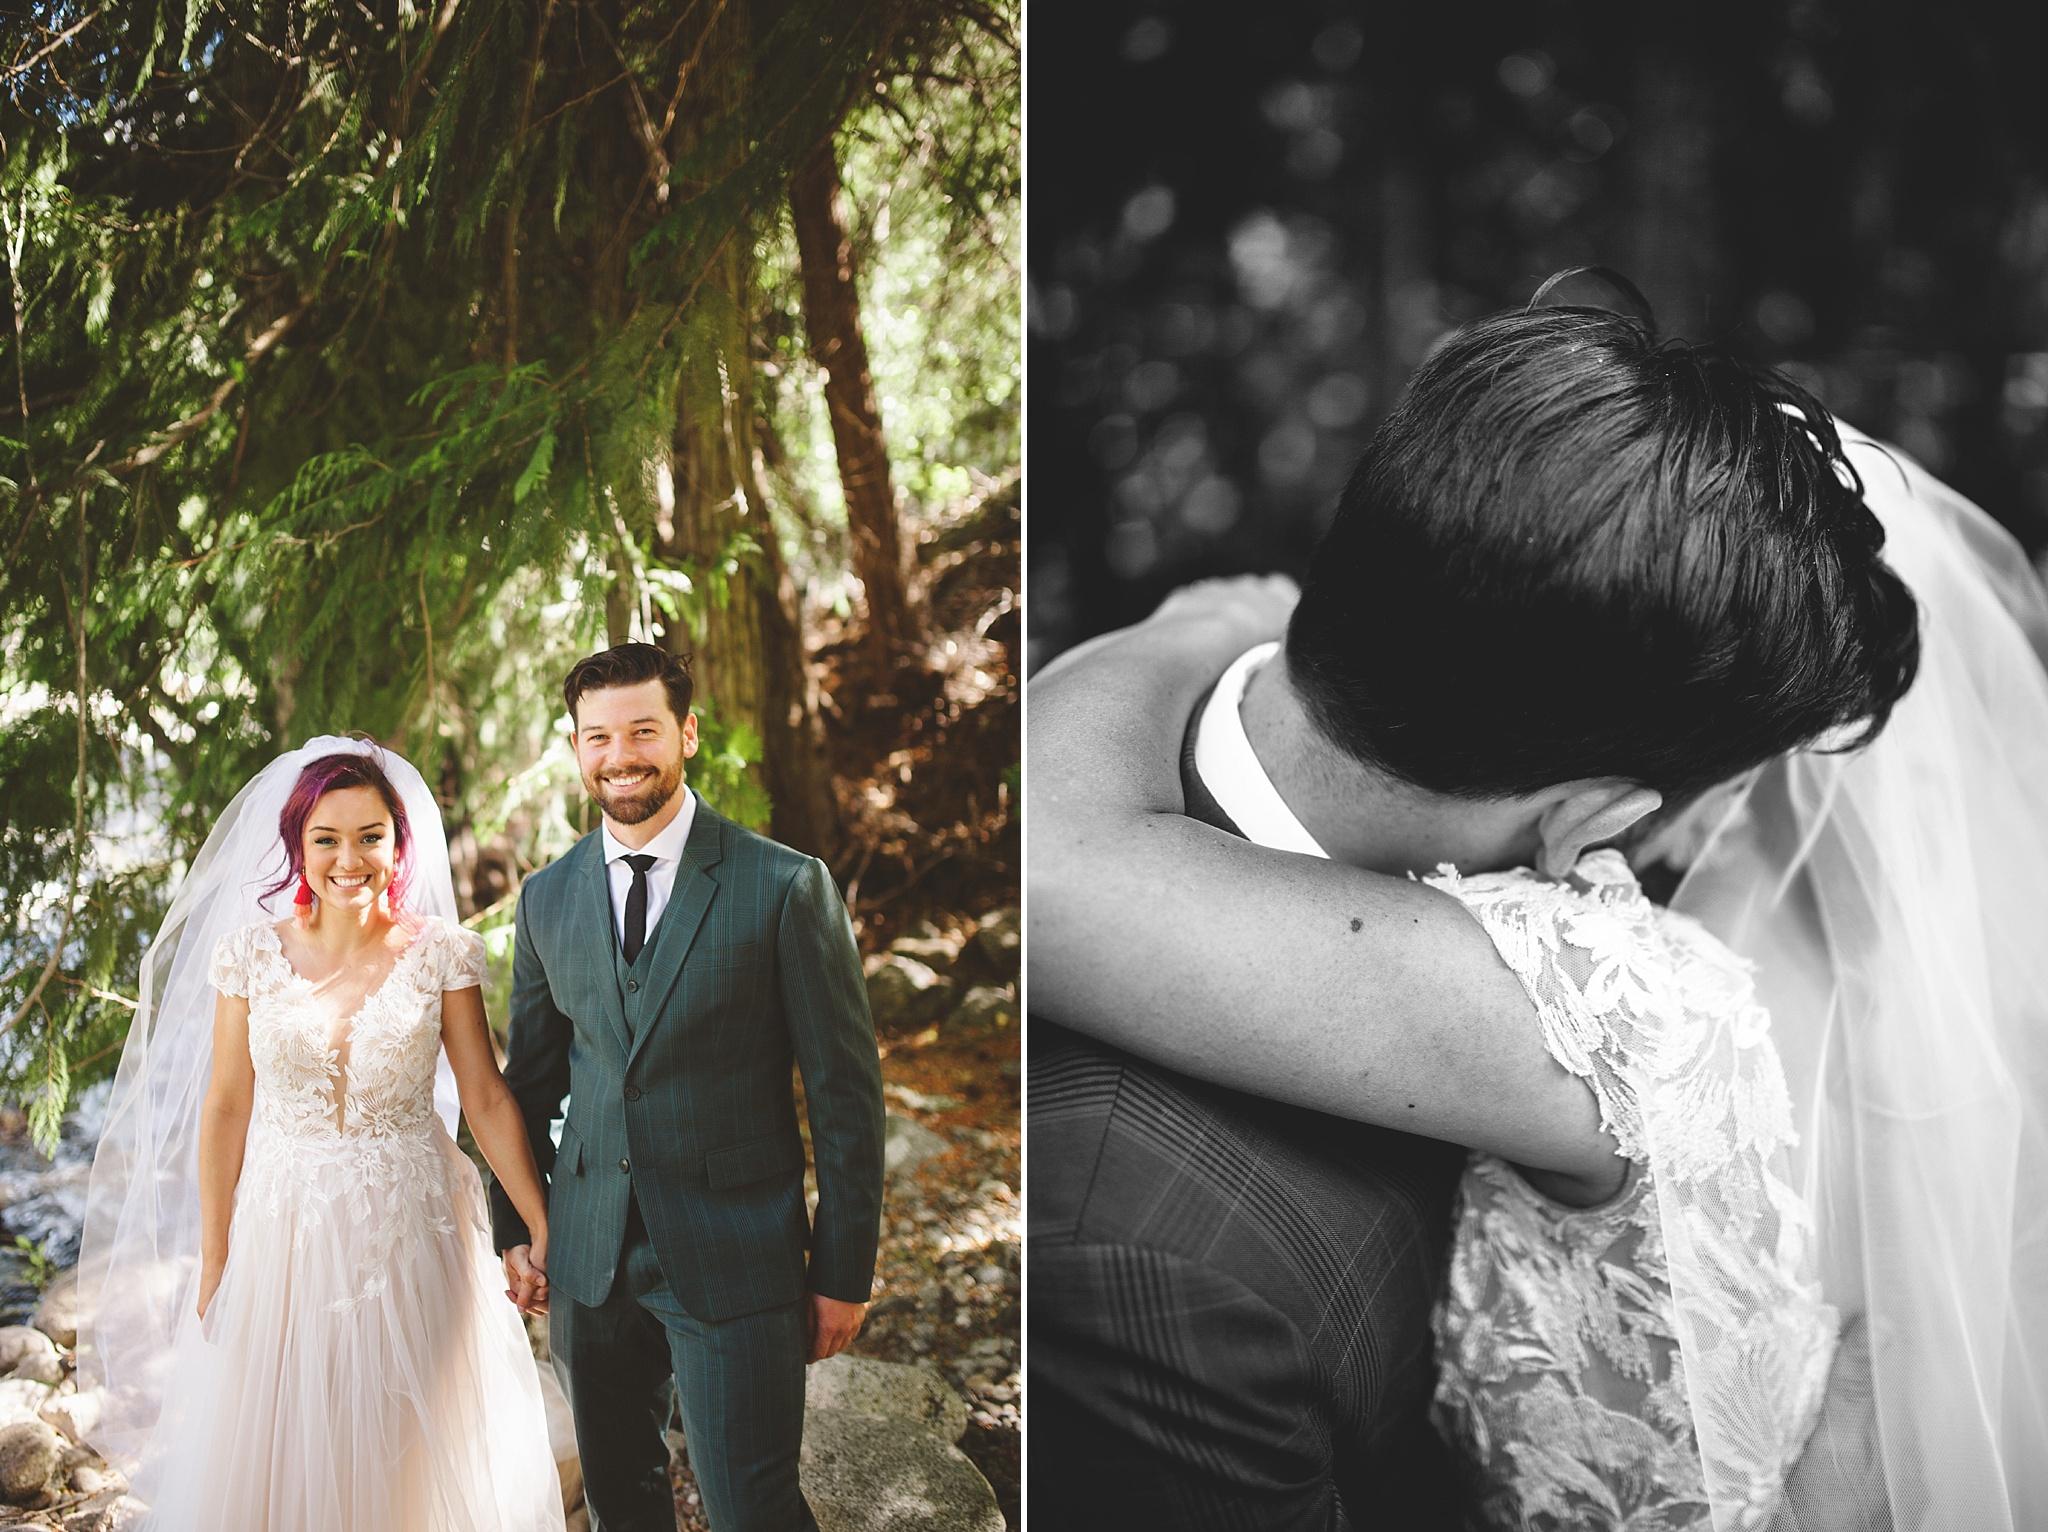 wedding portraits in woods of washington